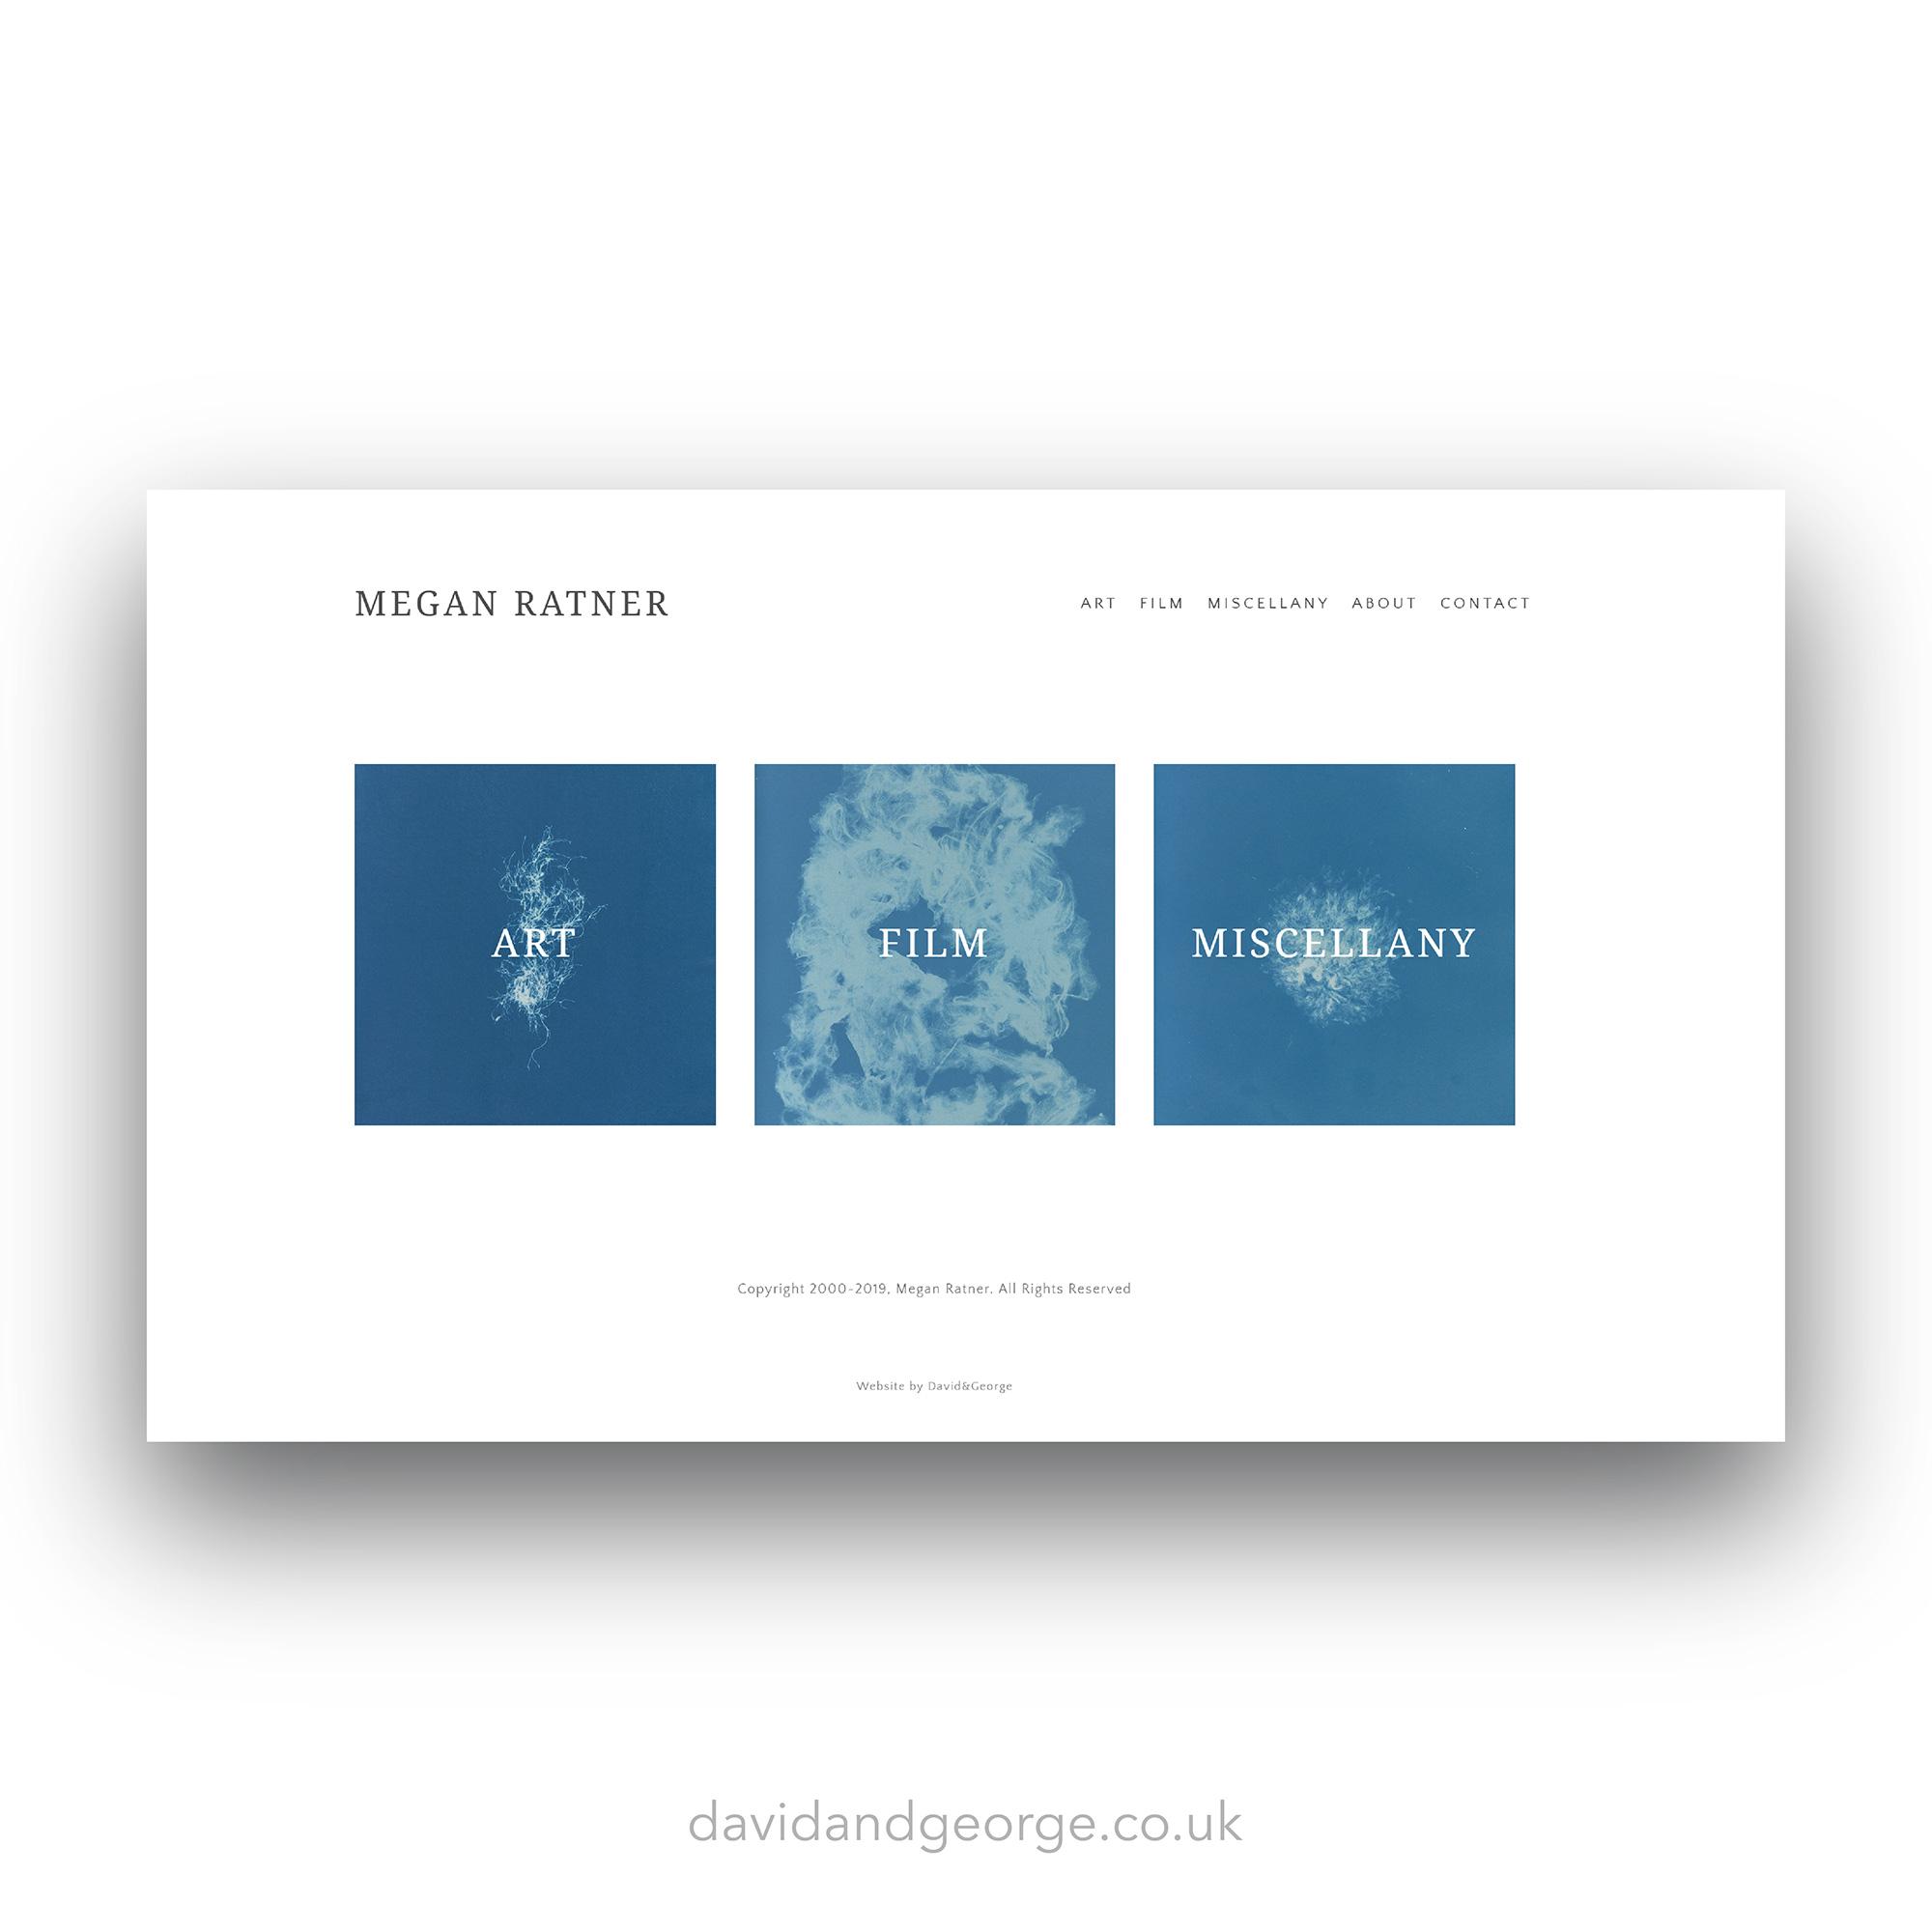 squarespace-website-design-london-edinburgh-uk-david-and-george-megan-ratner-writer-artist-filmmaker-new-york.jpg